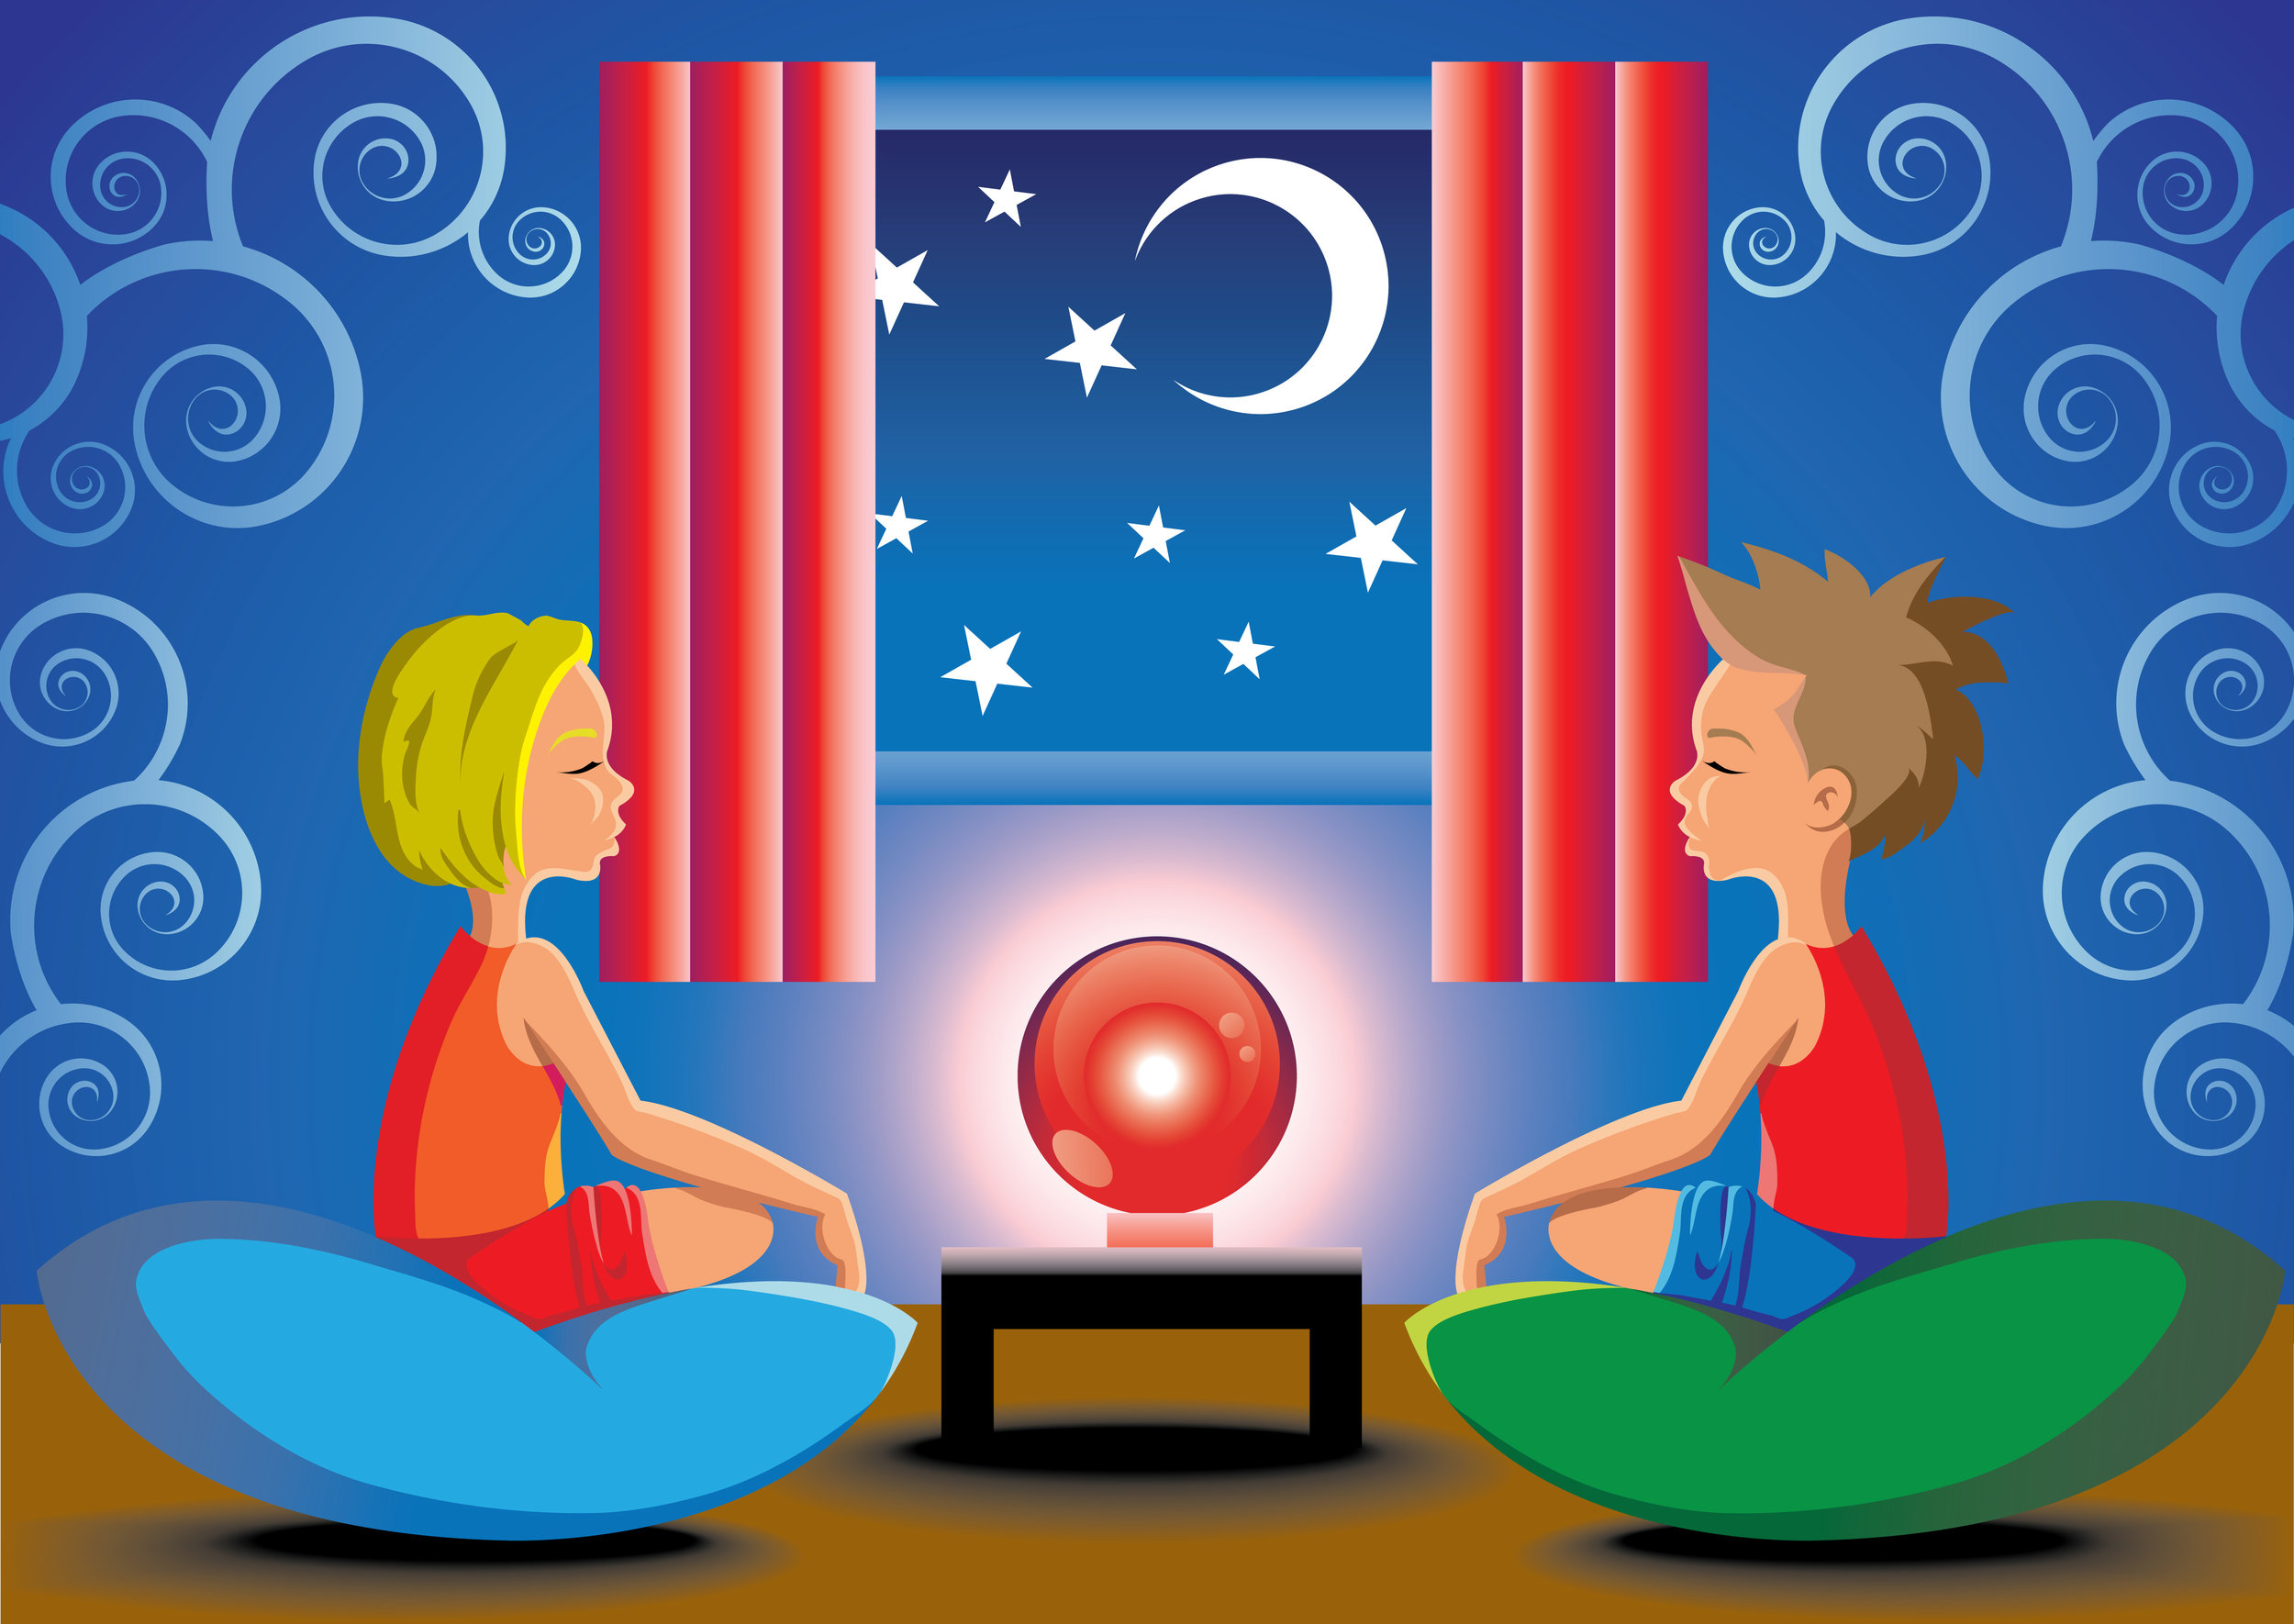 fortune teller kids having a spiritualism seance